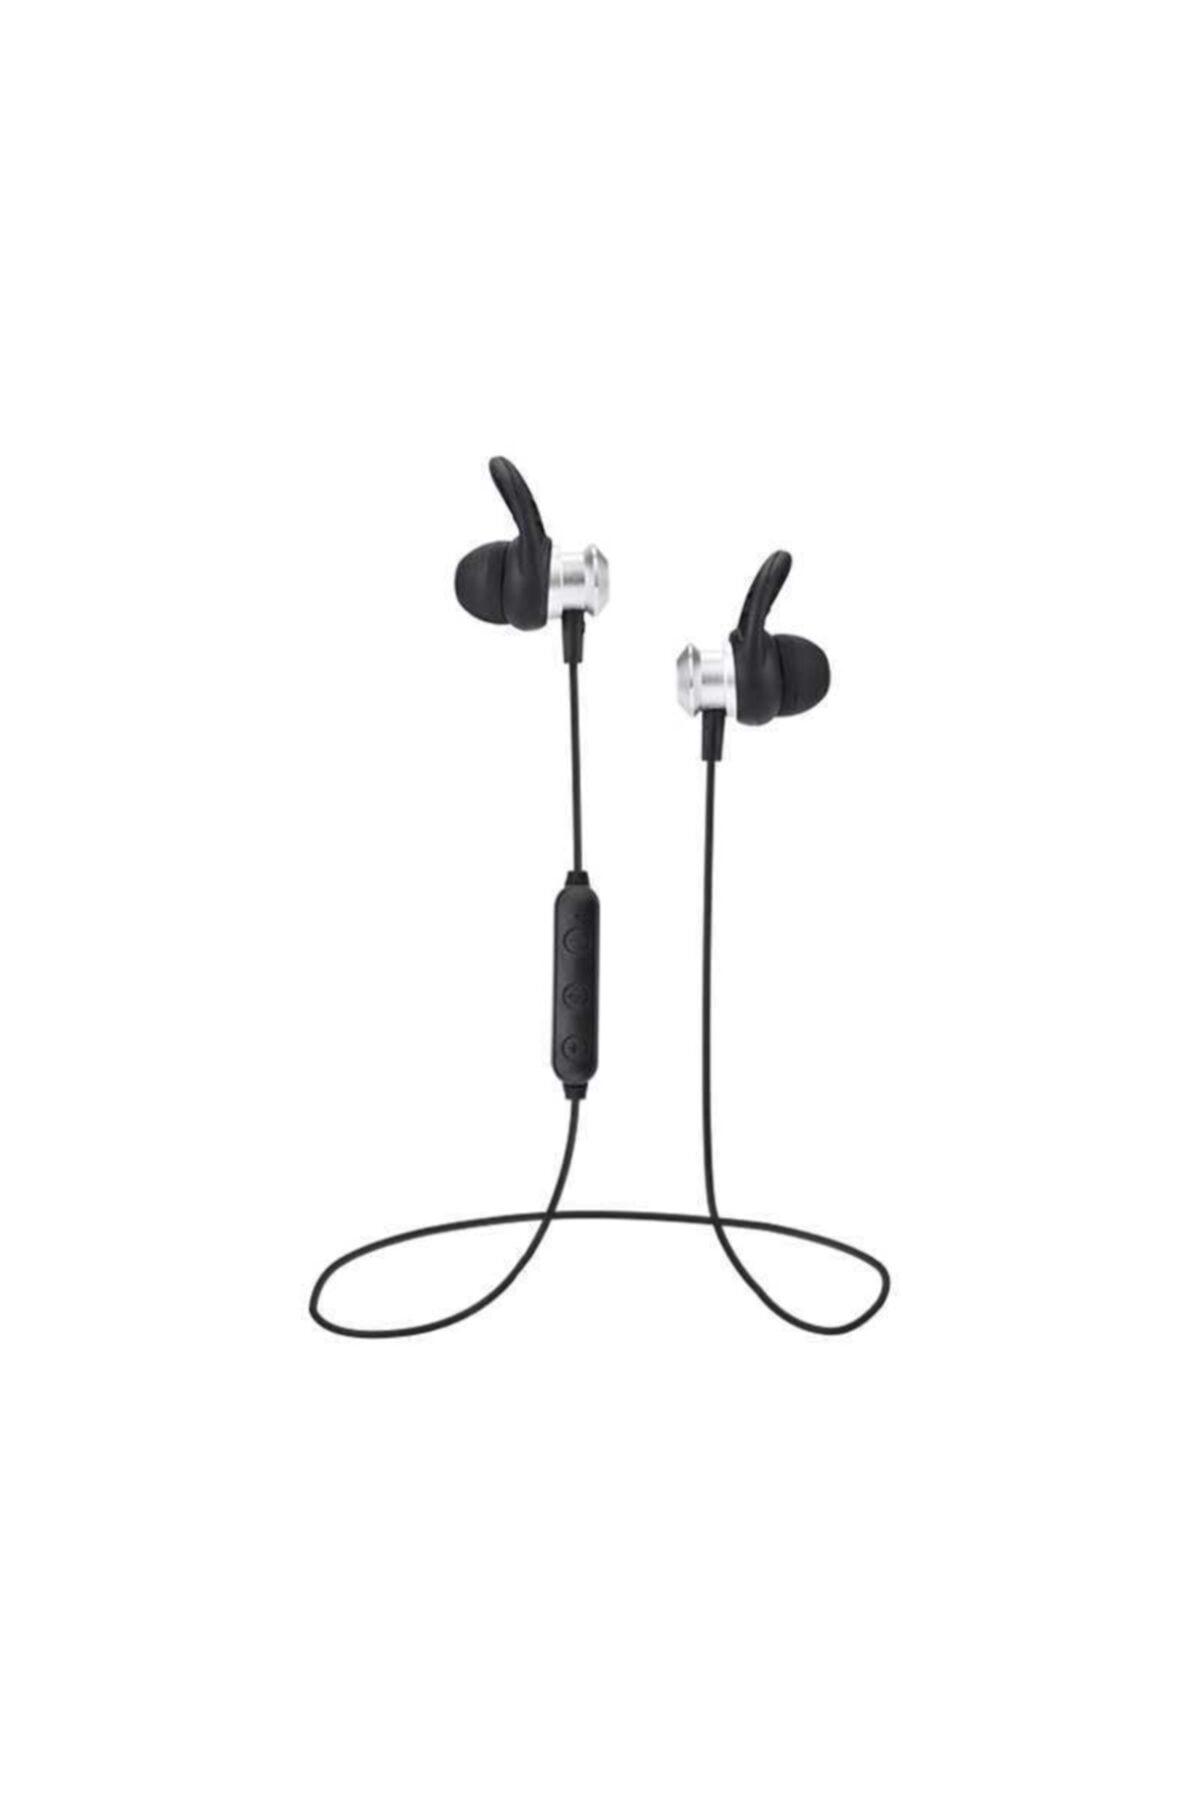 zore Bluetooth Kulaklık Kulakiçi Sporcu Kumandalı Mıknatıslı Bluetooth 5.0 Destekli 1